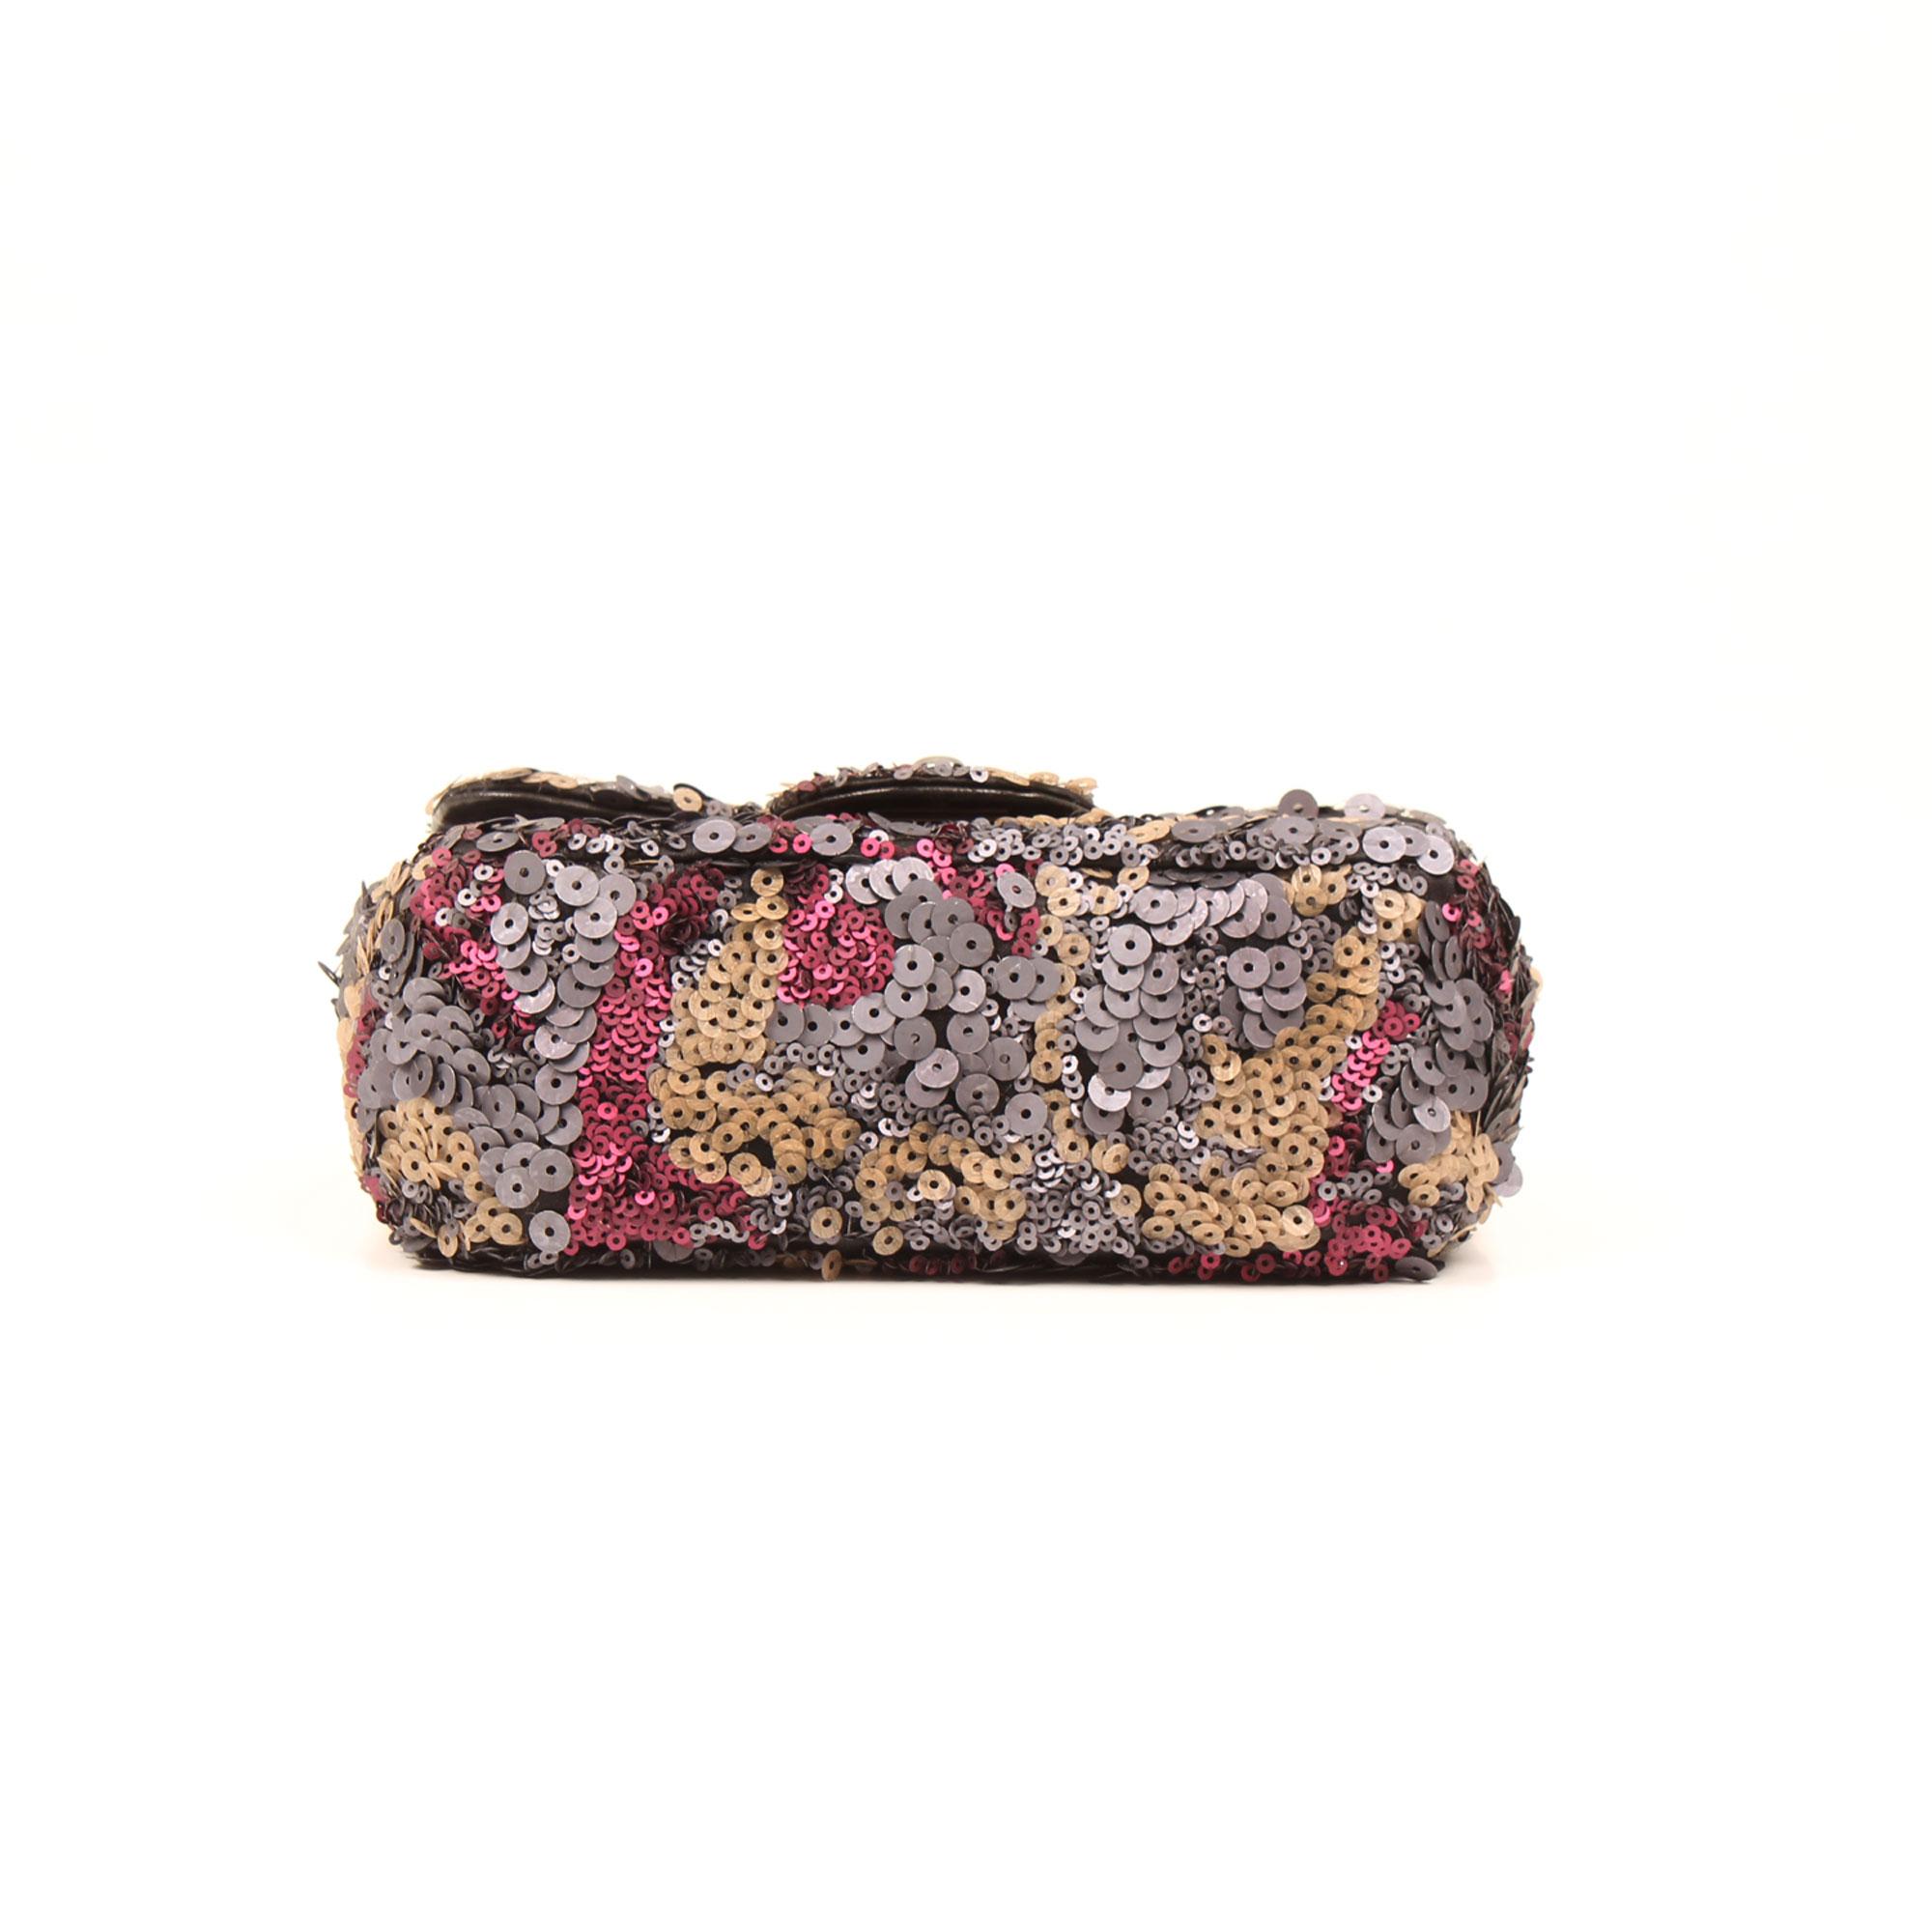 Imagen de la base del bolso chanel mini classic flap lentejuelas multicolor